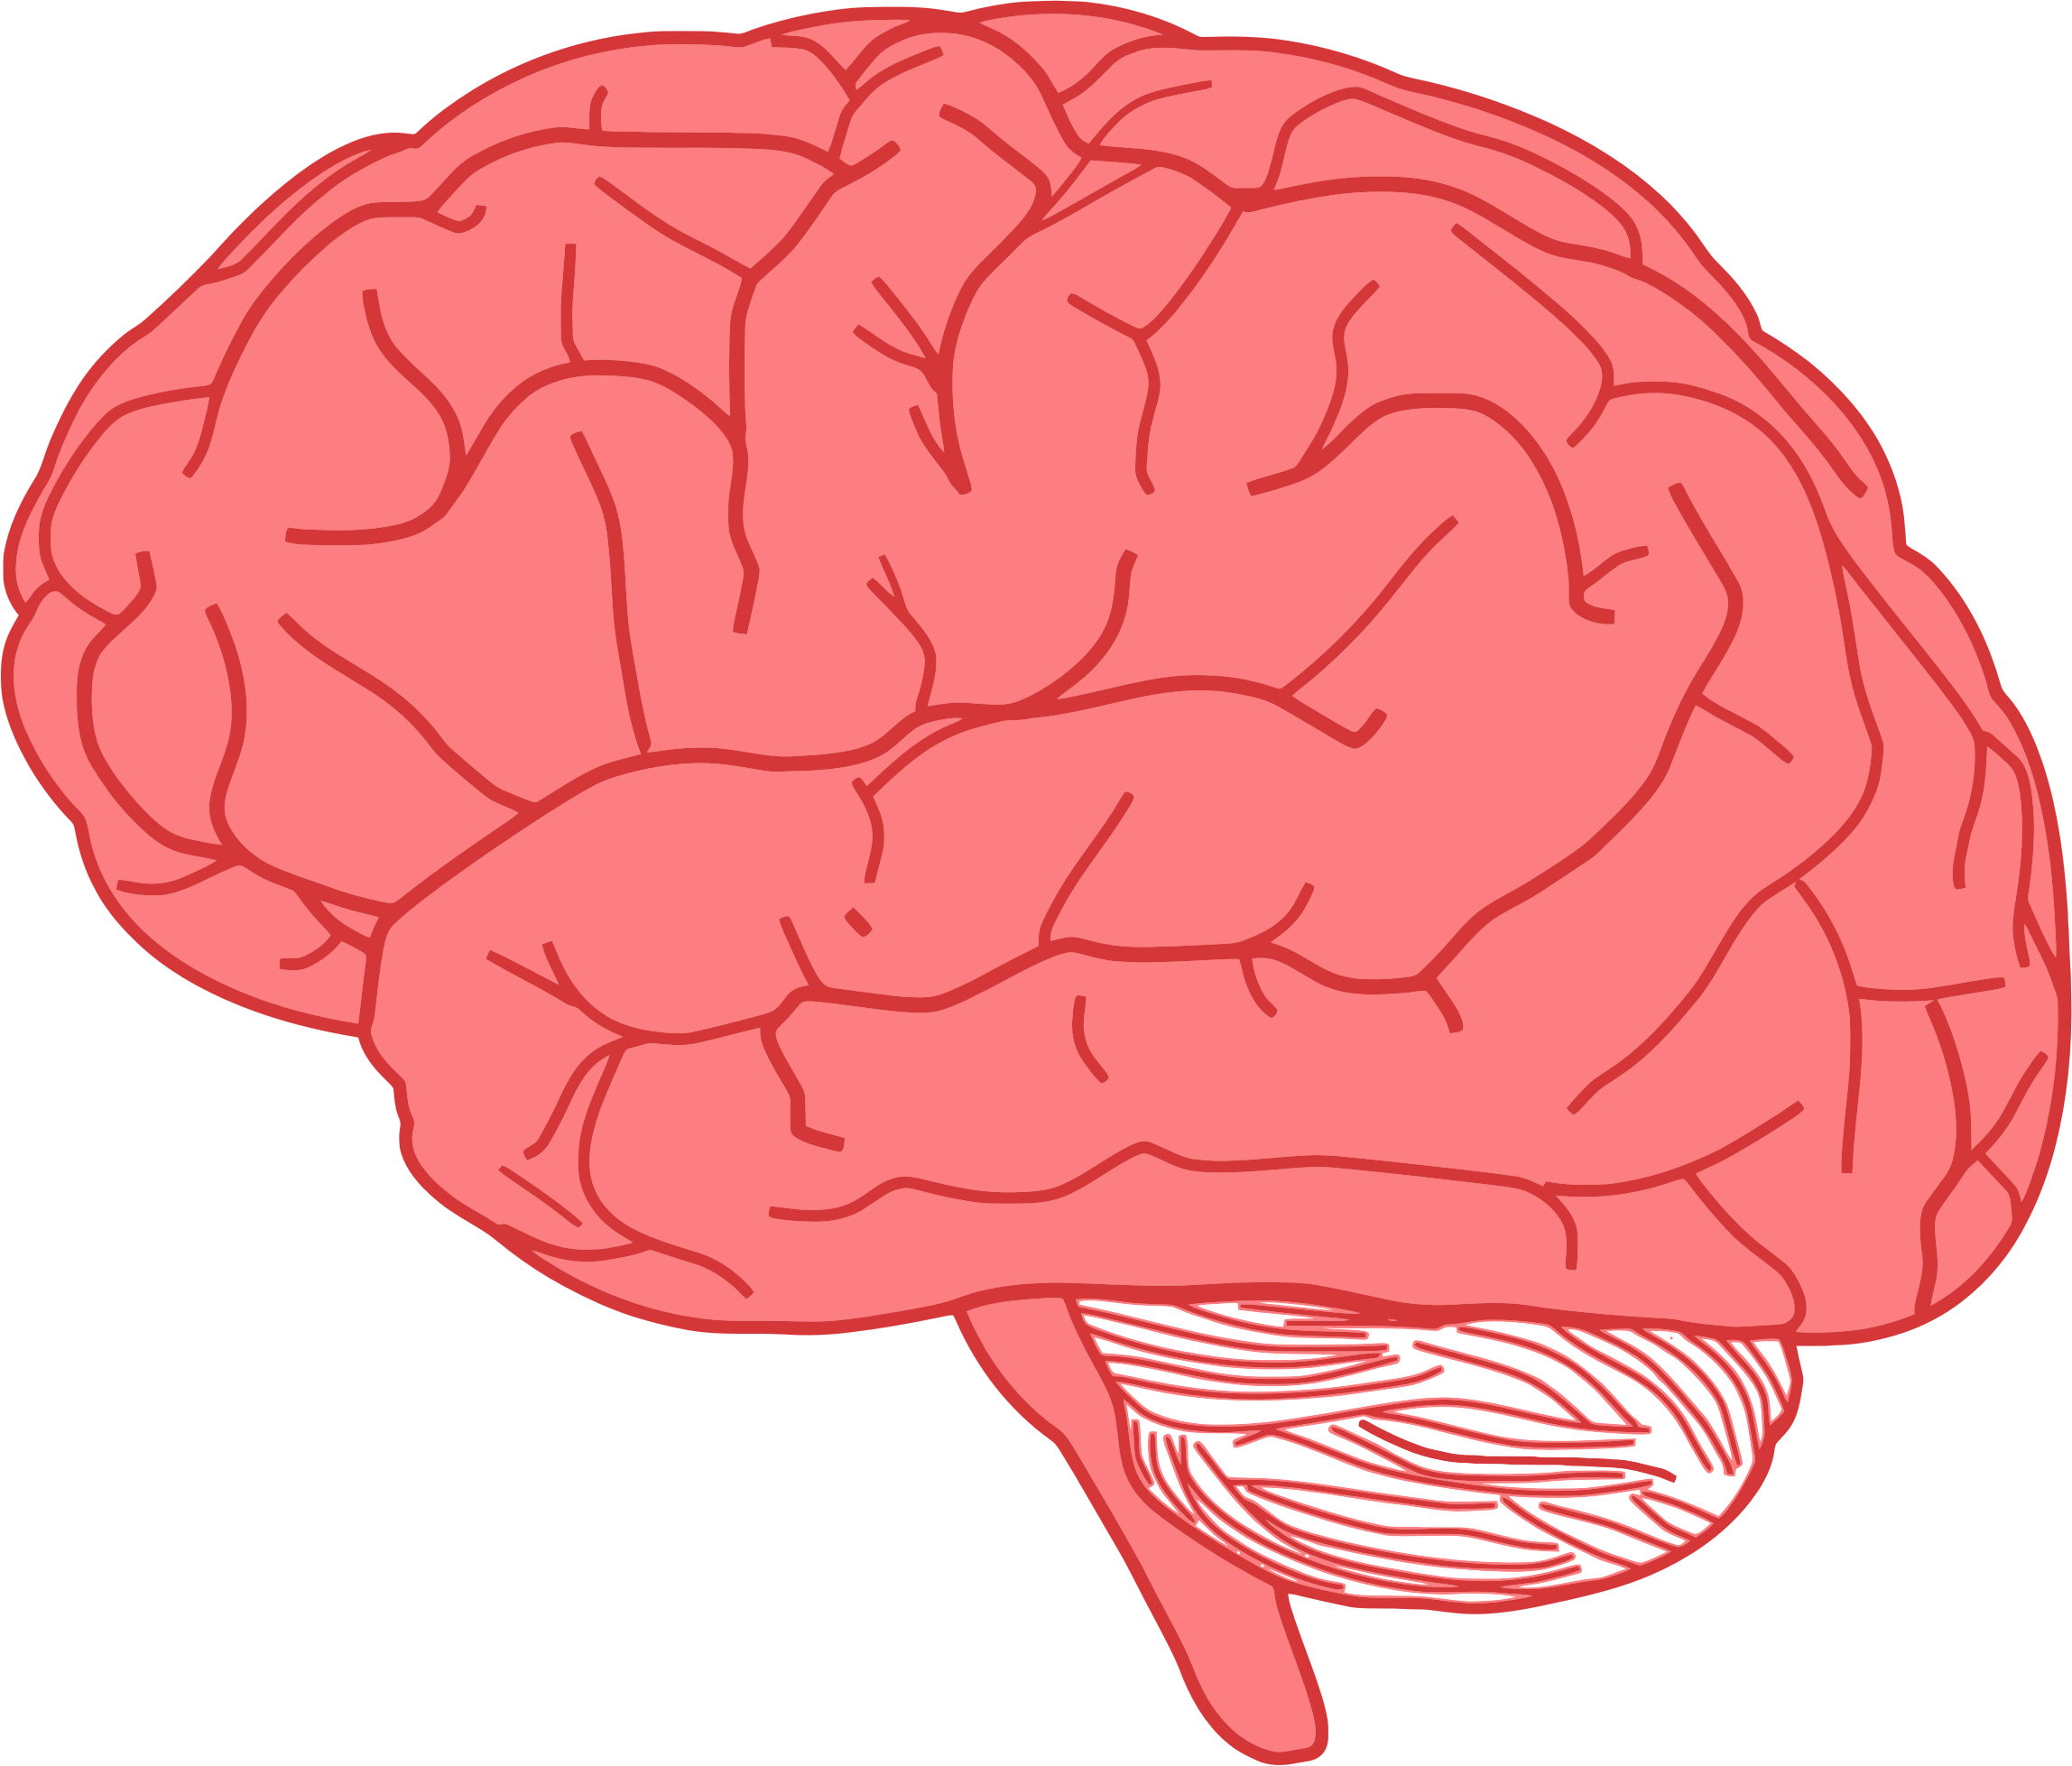 Profile optimized big image. Psychology clipart cool brain